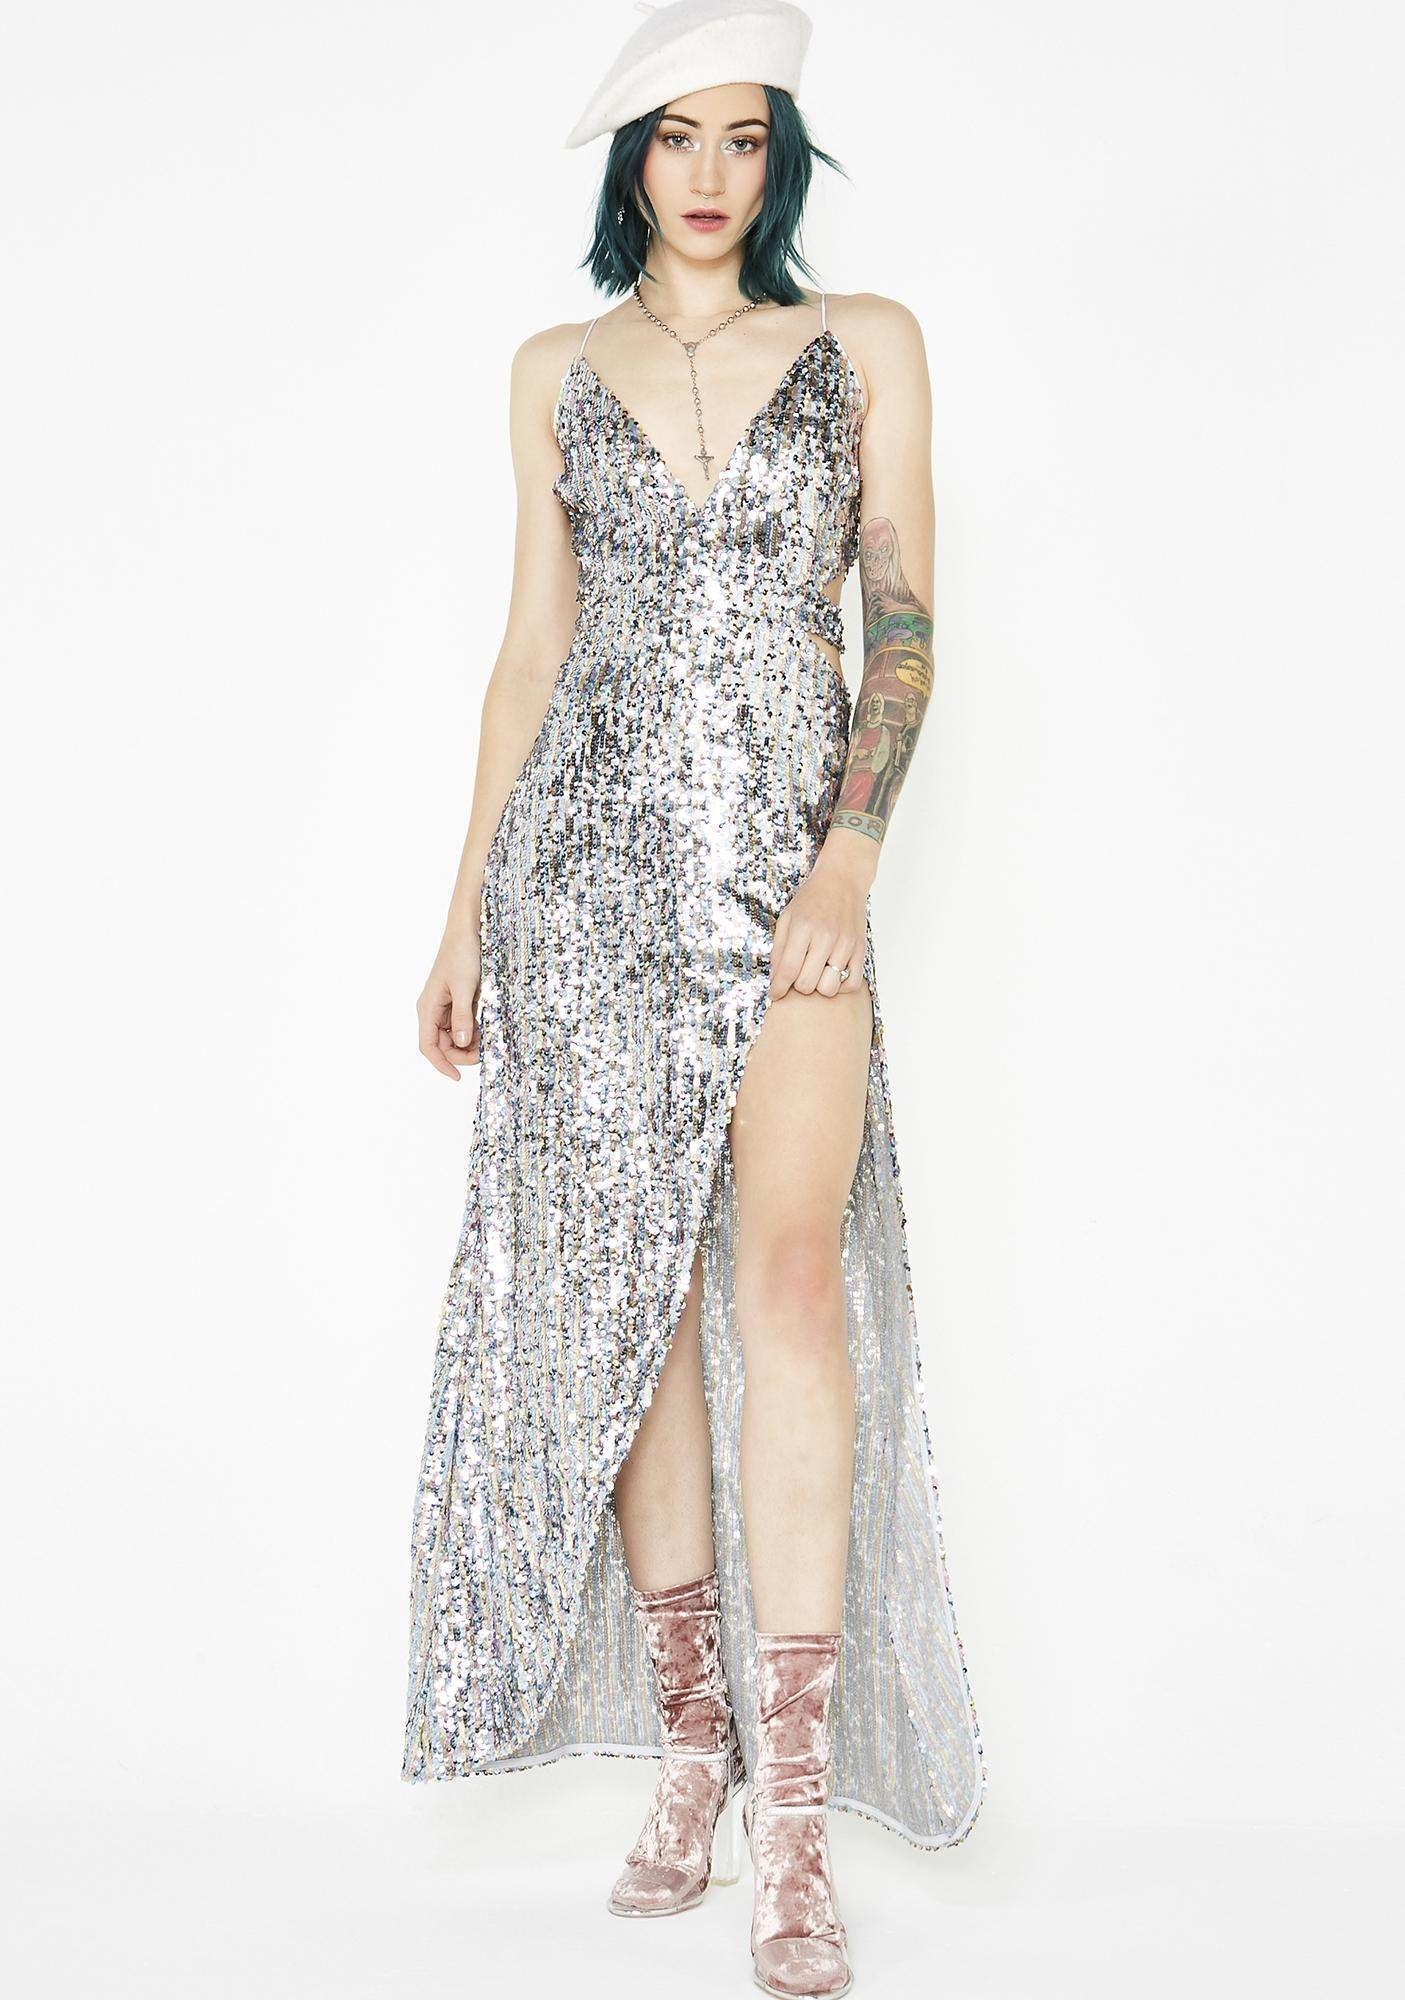 a0432dfe86 Showtime Maxi Dress | Kris ivy | Dresses, Fishnet dress, Fashion